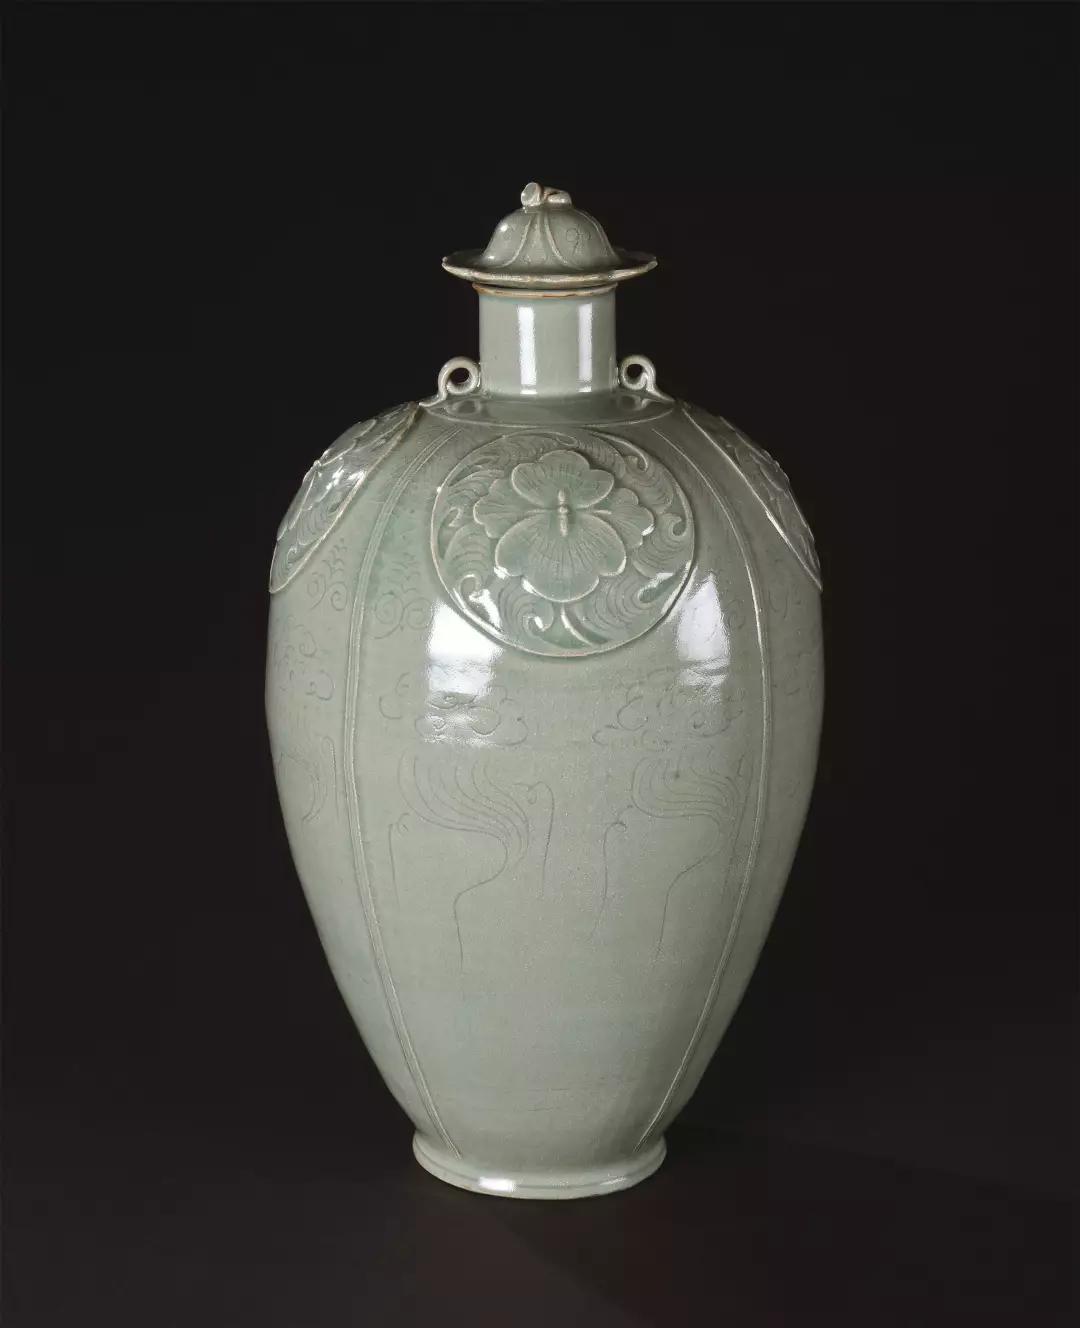 Lot 0224 清代(1644-1911) 斗彩鸡缸杯